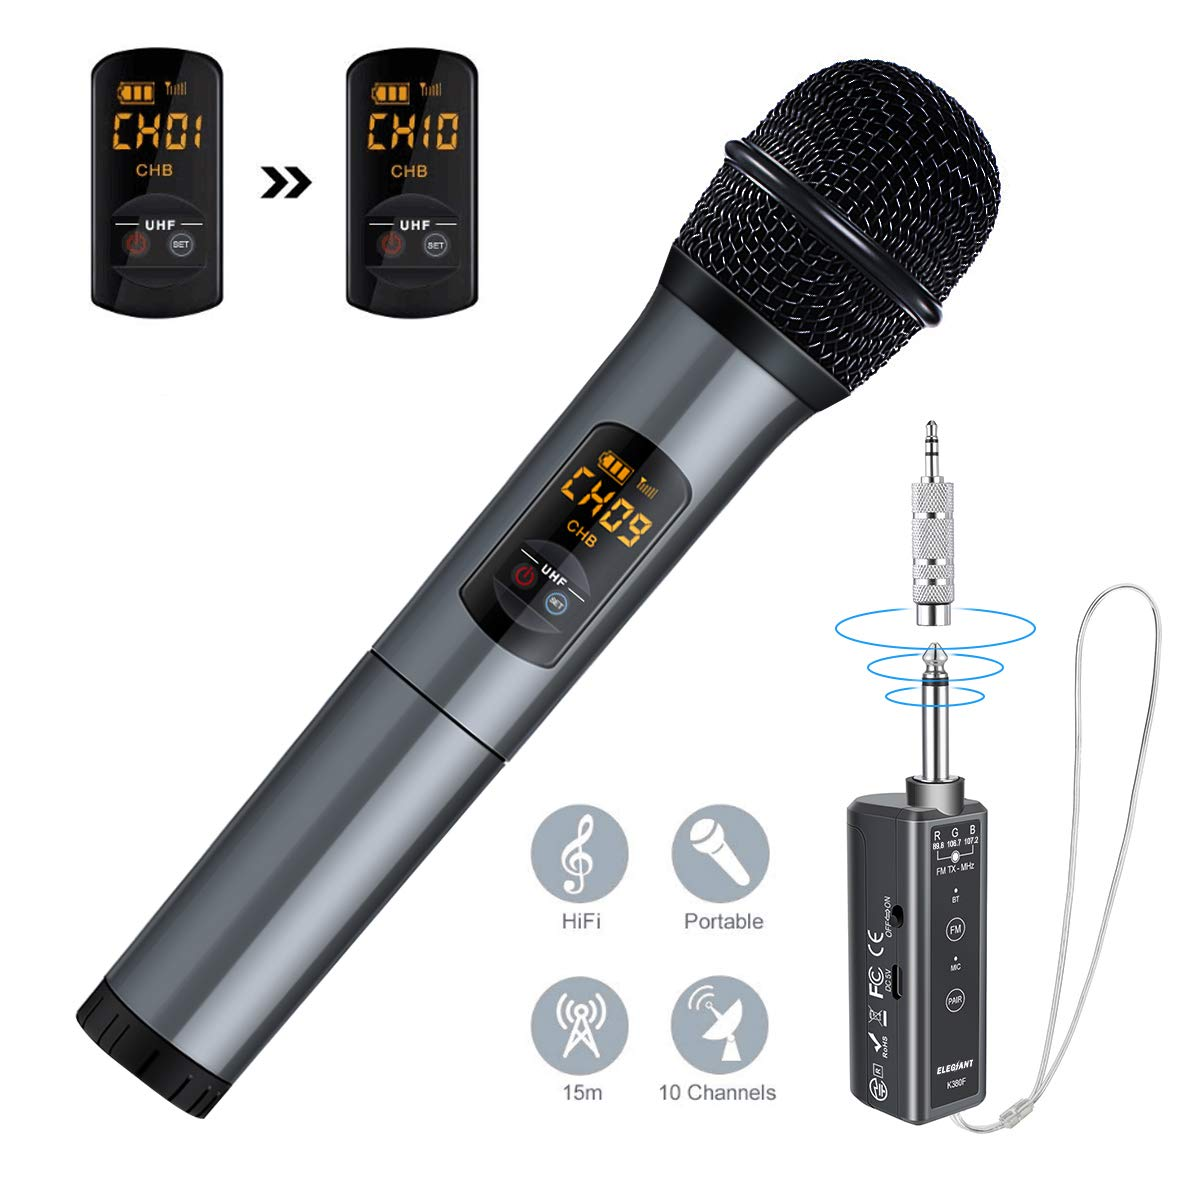 Funkmikrofon für 19,99€